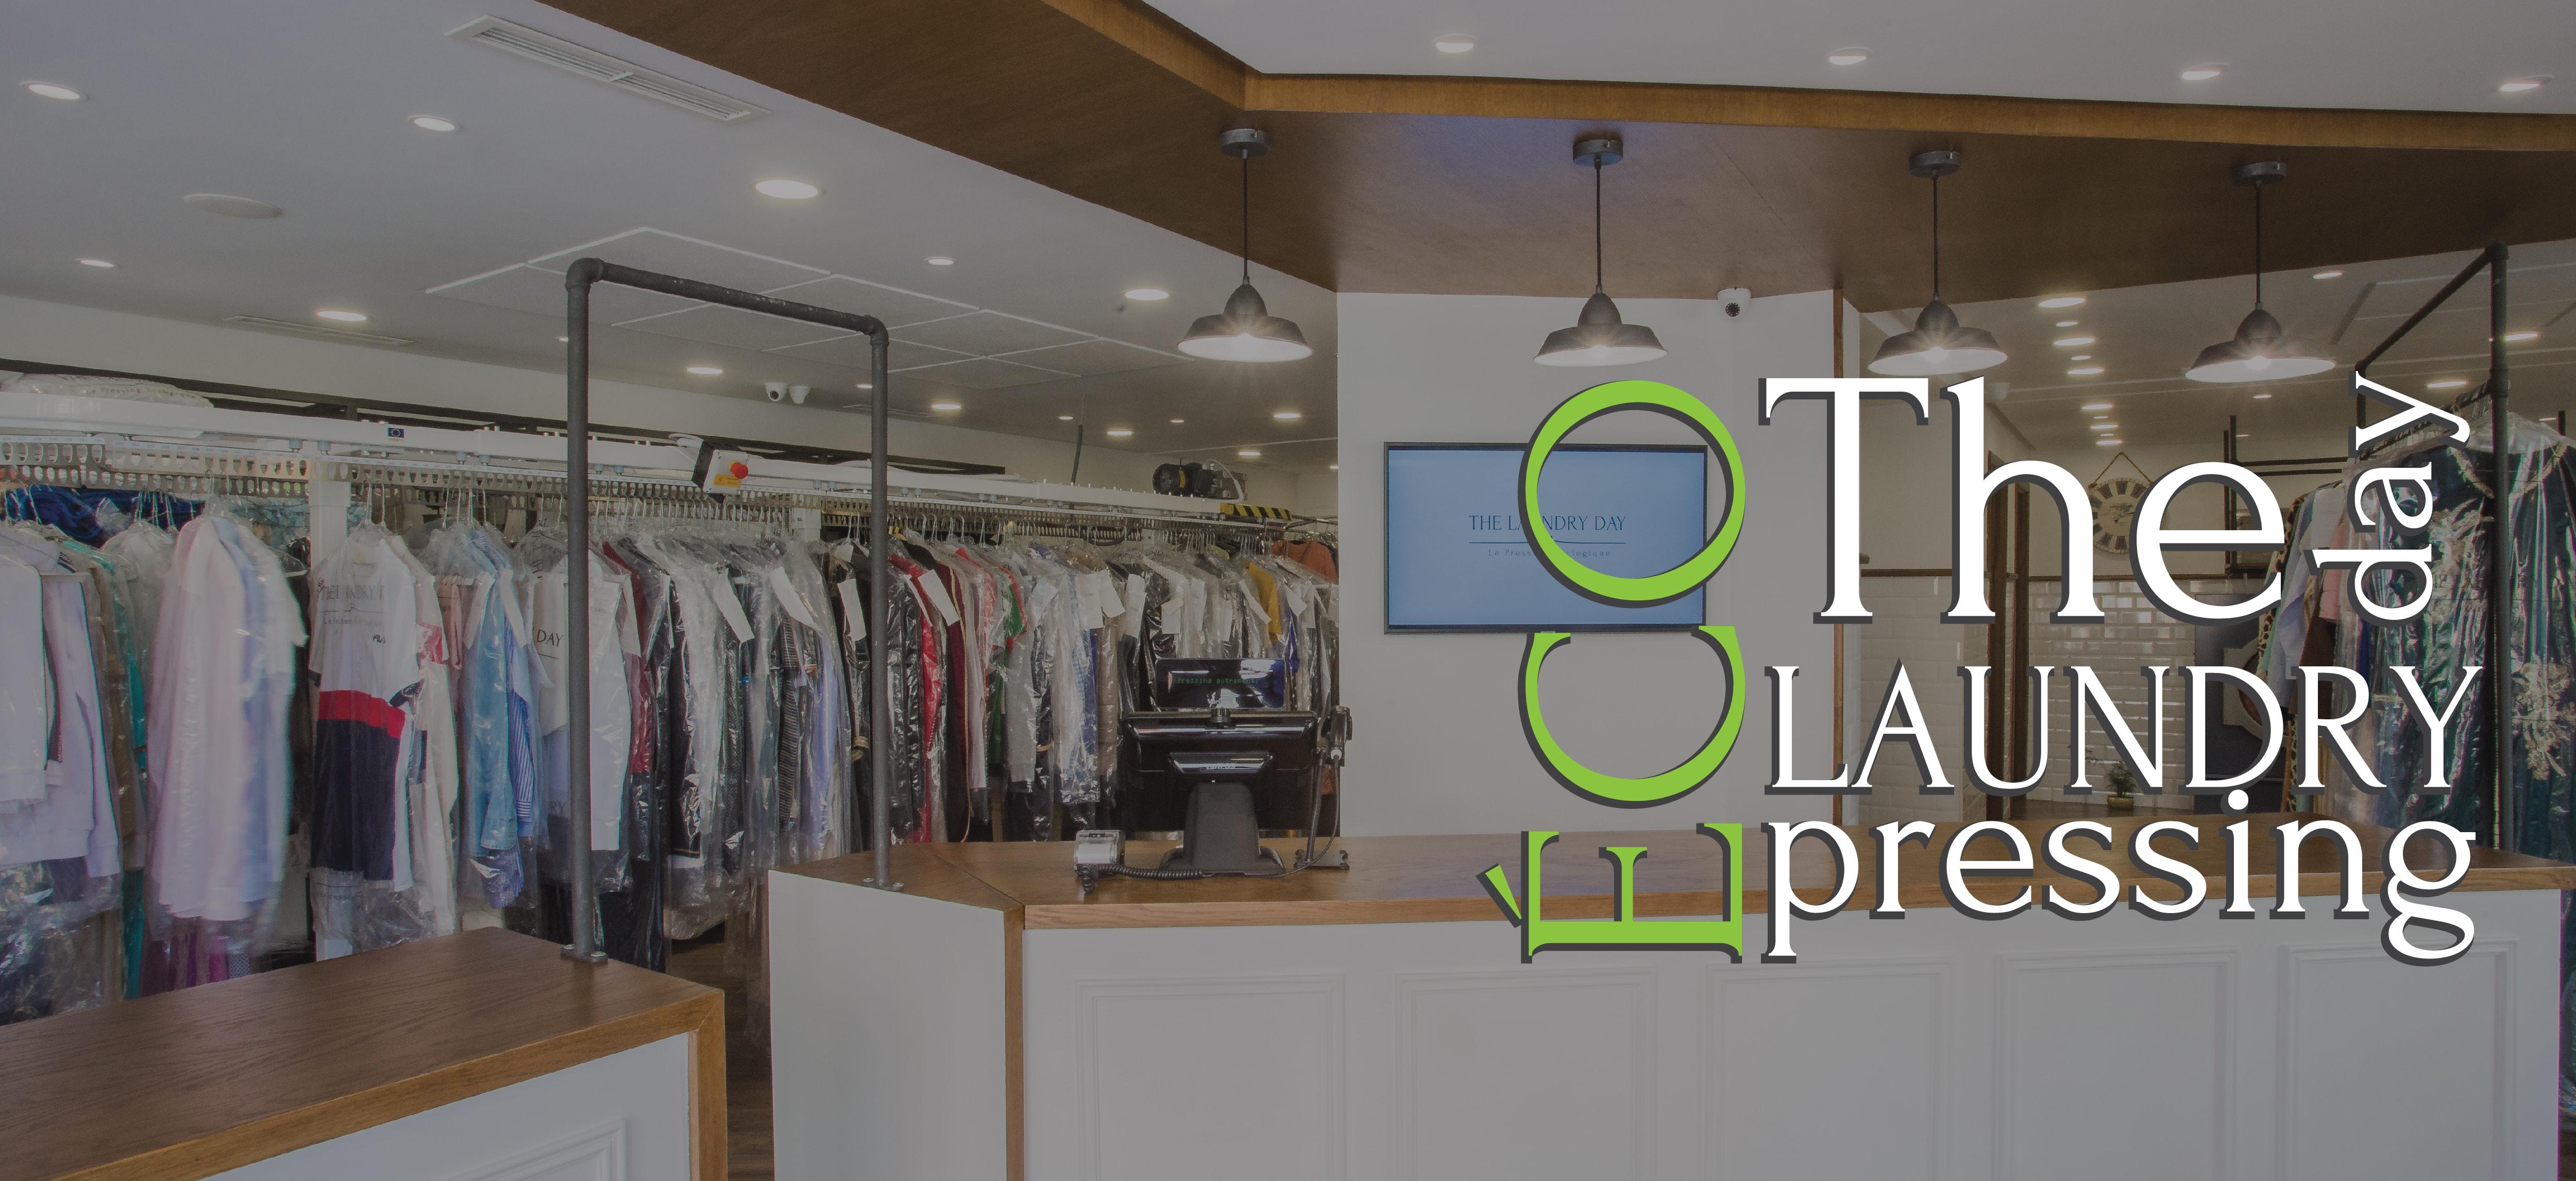 concept boutique magasin the laundry day pressing écologique tanger maroc